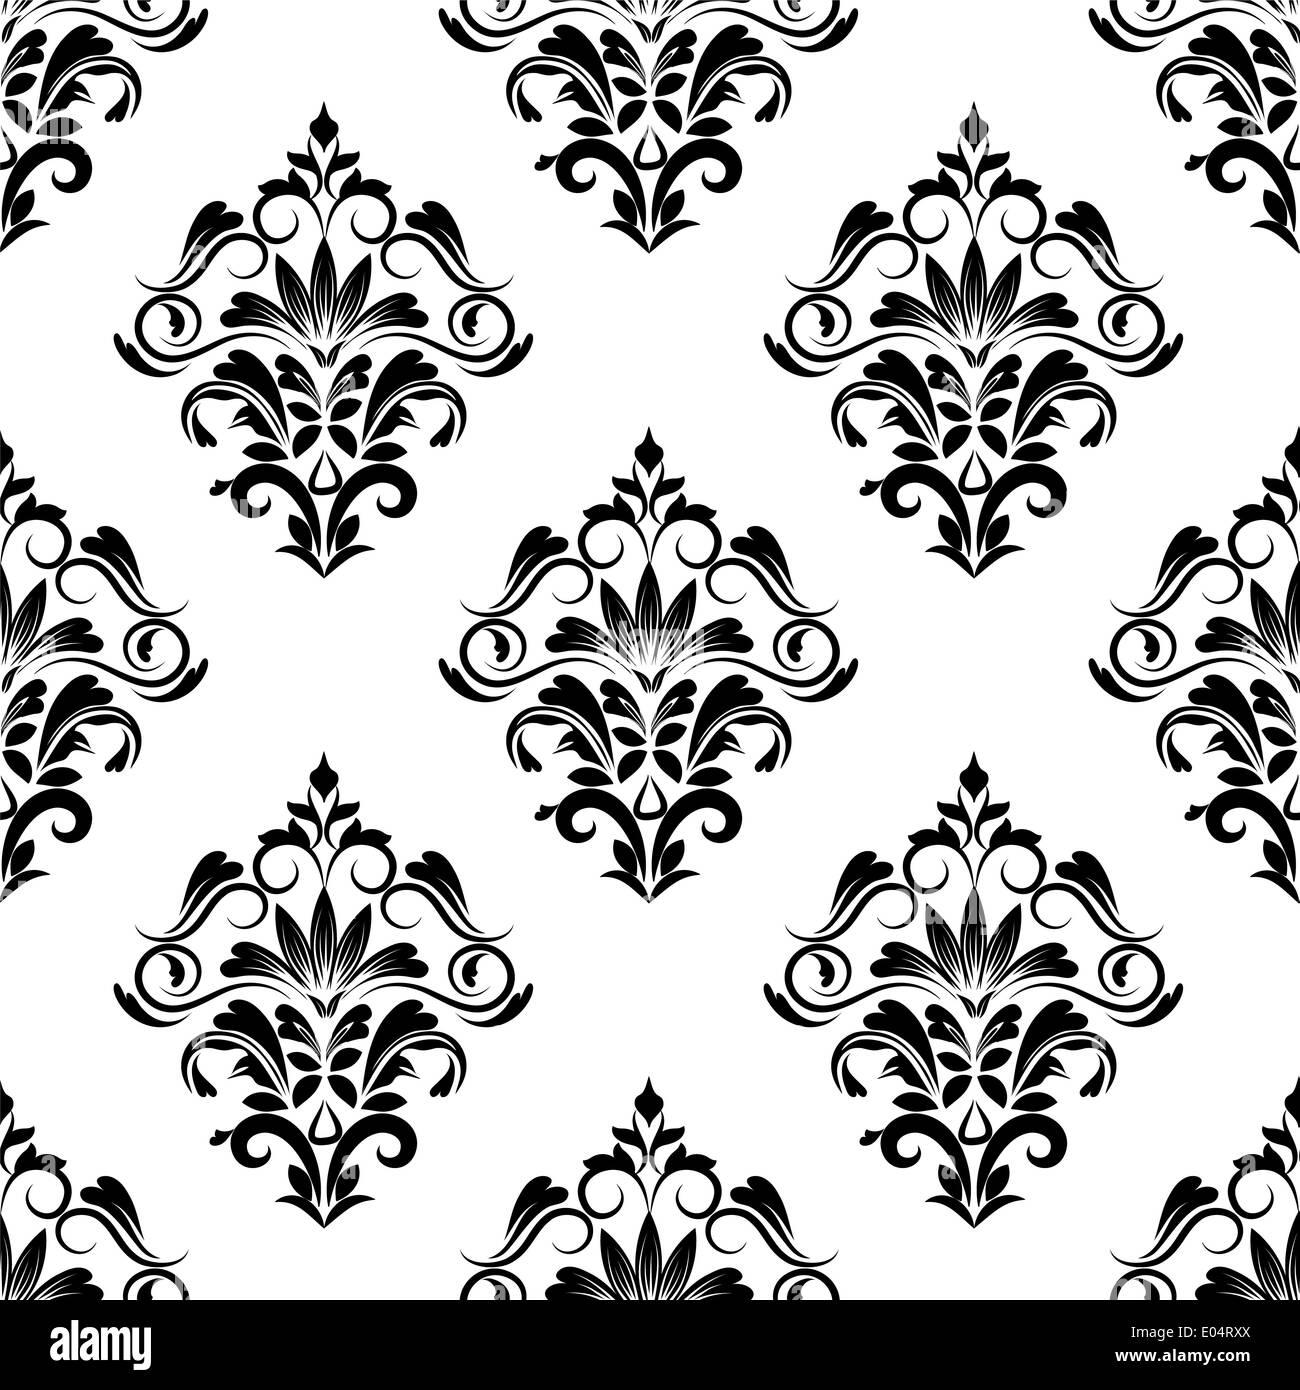 Seamless Black And White Damask Wallpaper